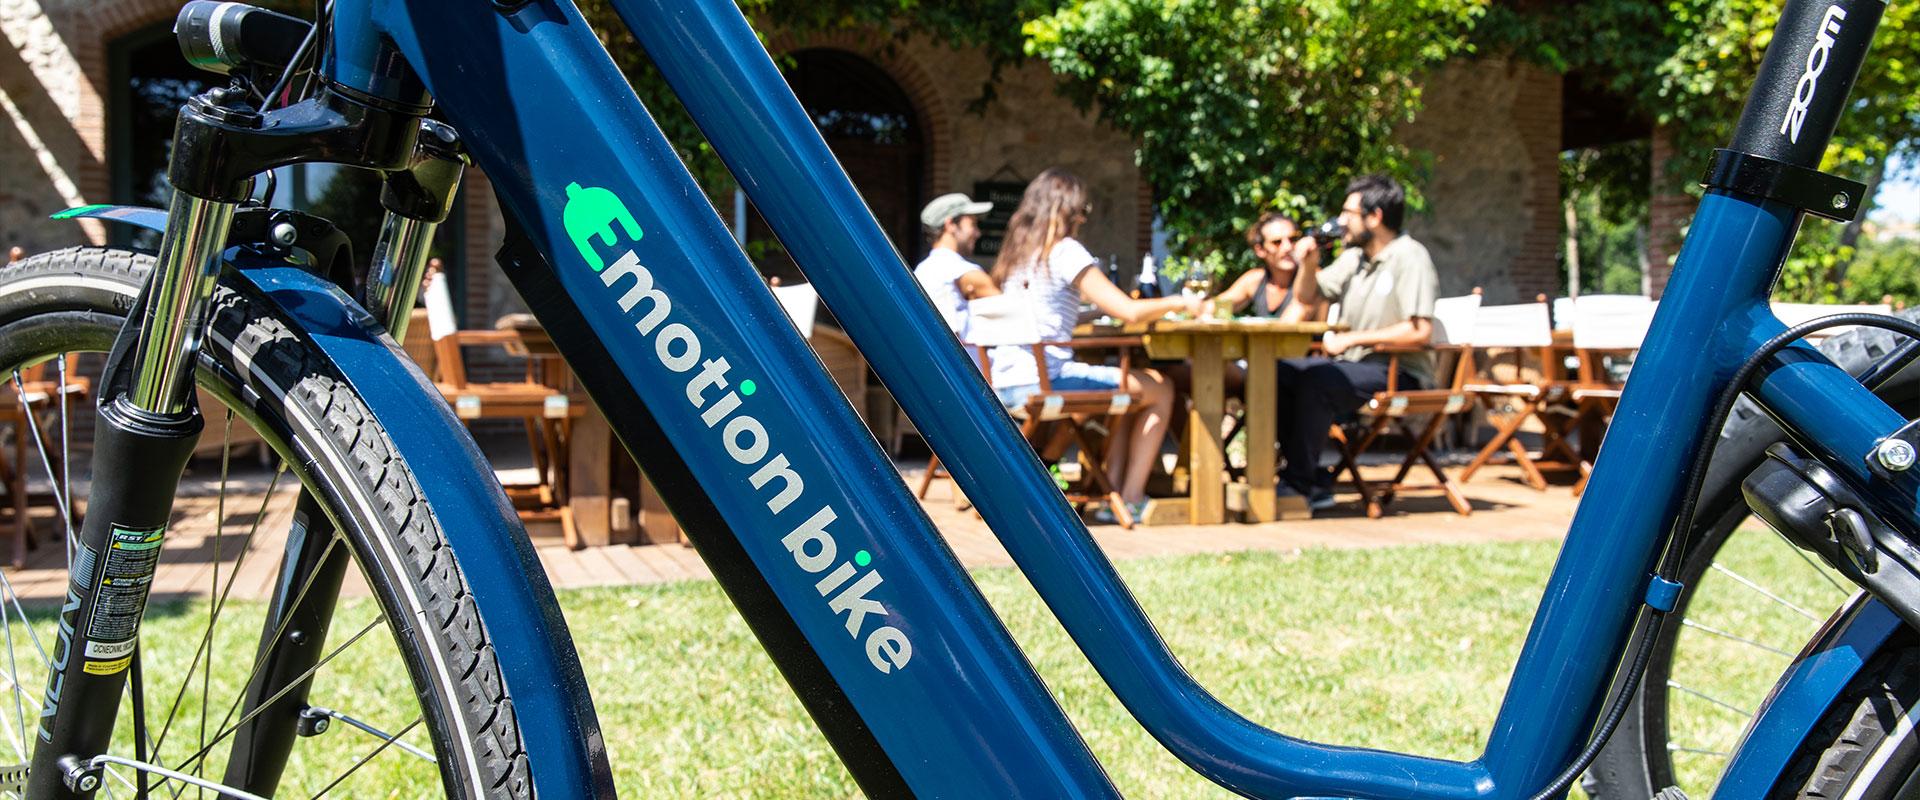 Saiano e-Bike Tour: Valmarecchia's Taste